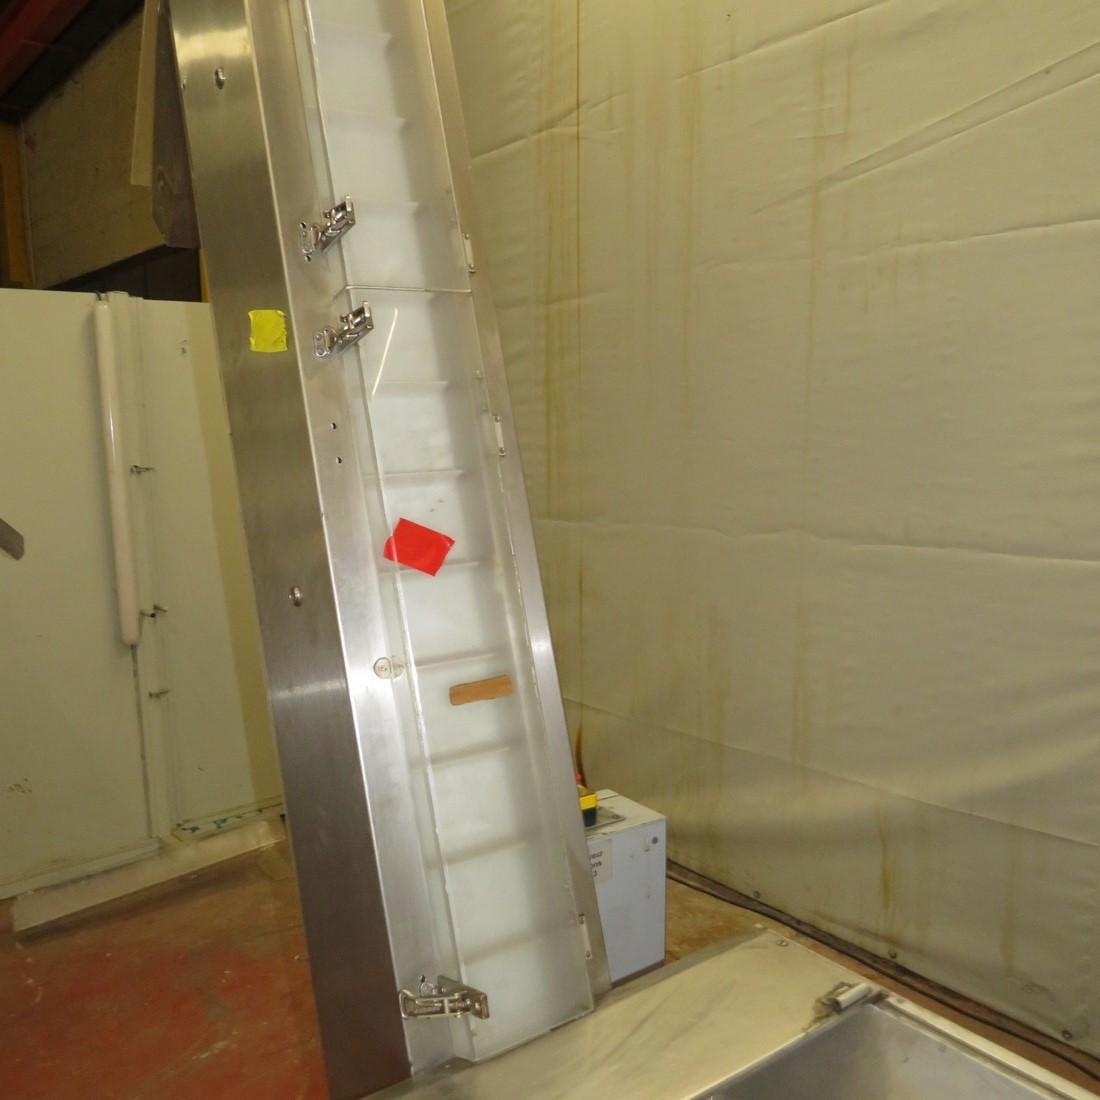 R4FB1159 Stainless steel FARMOMAC elevator conveyor - height 1900/2050 mm